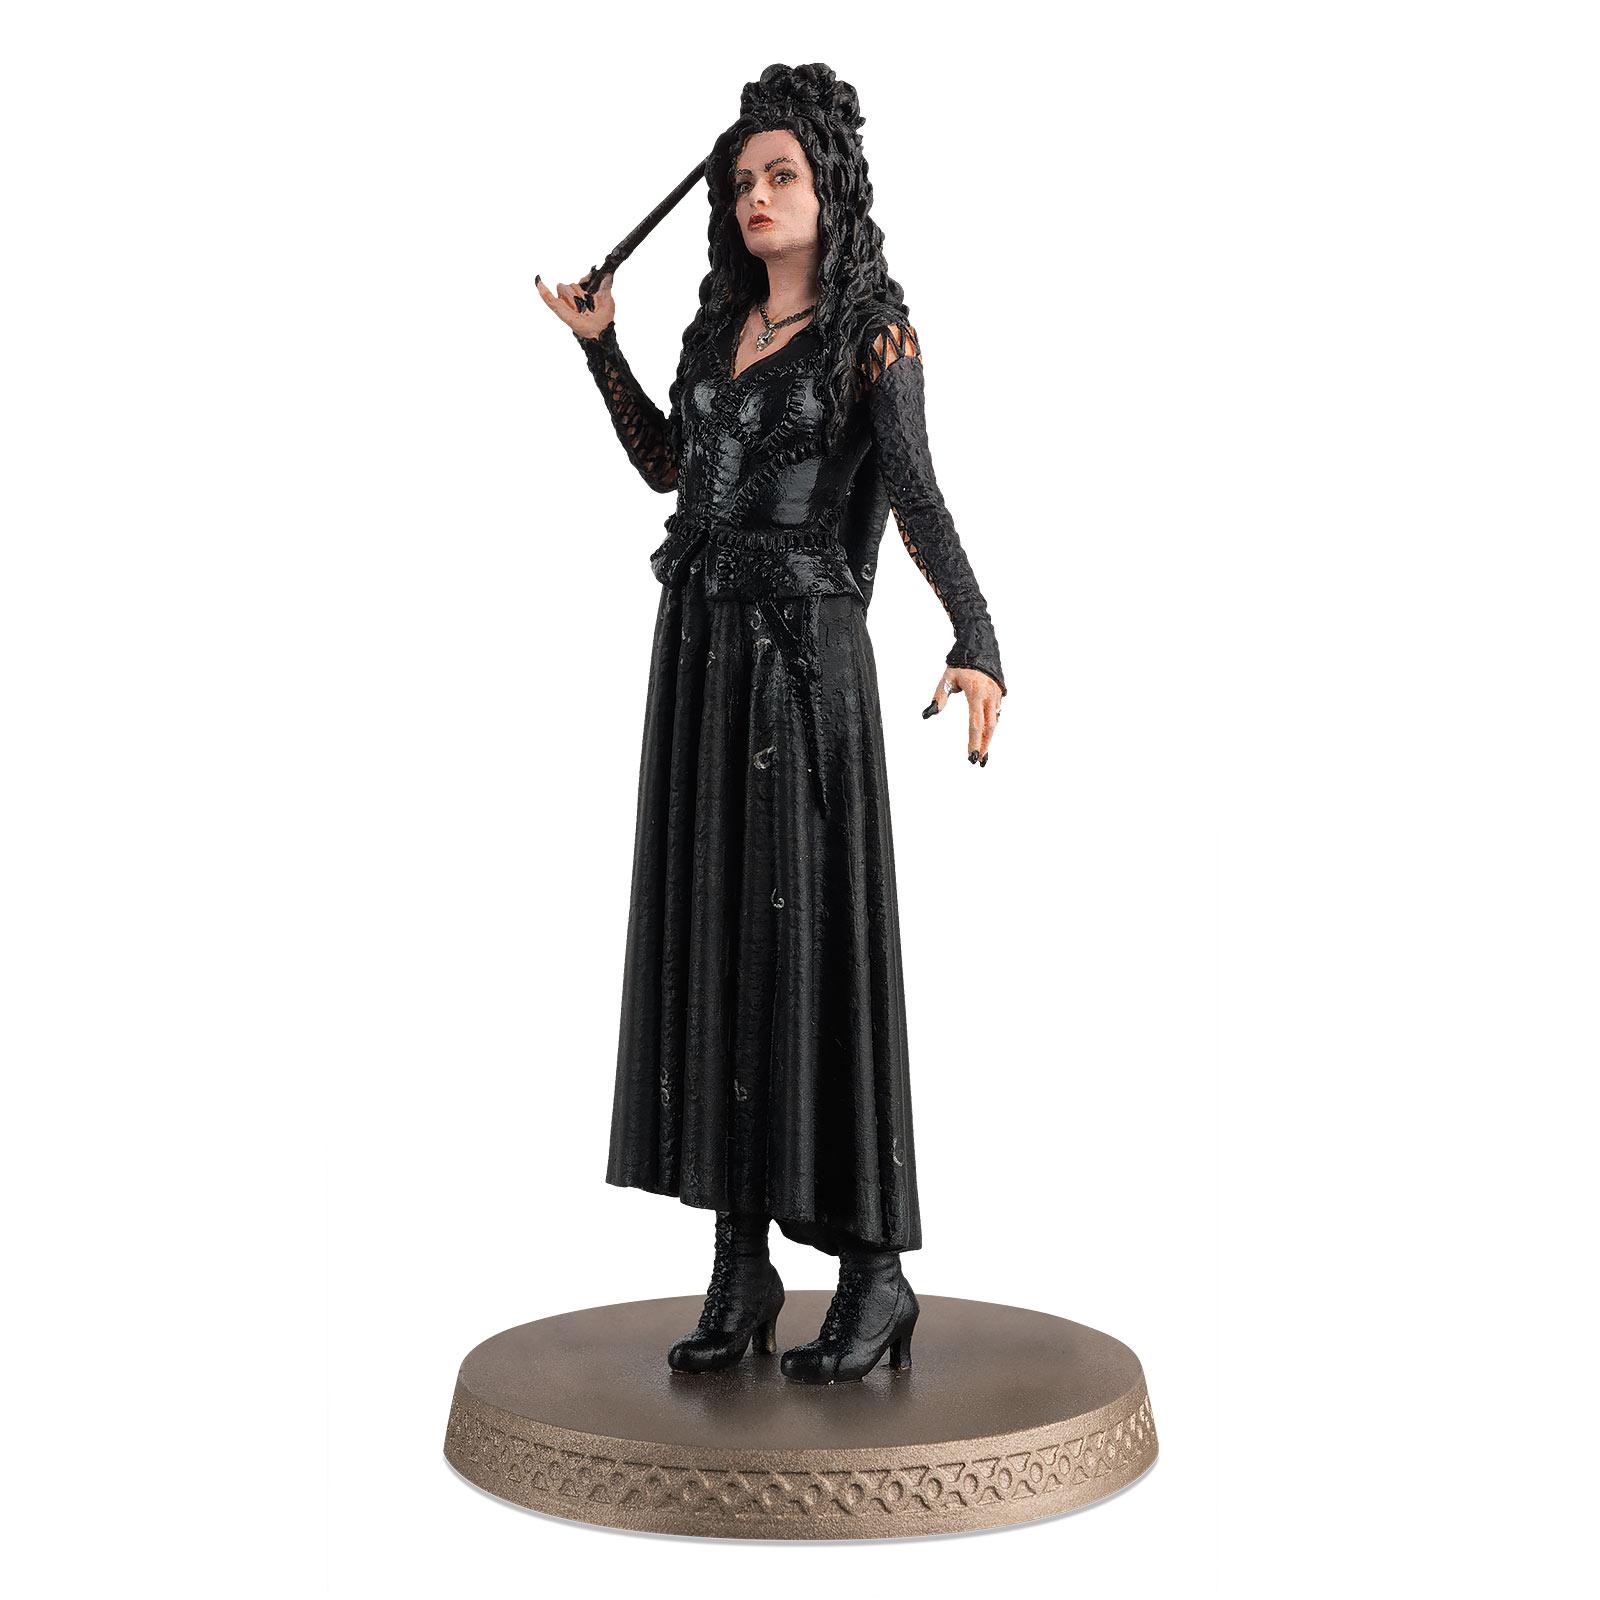 Bellatrix Lestrange Hero Collector Figur 12 cm - Harry Potter